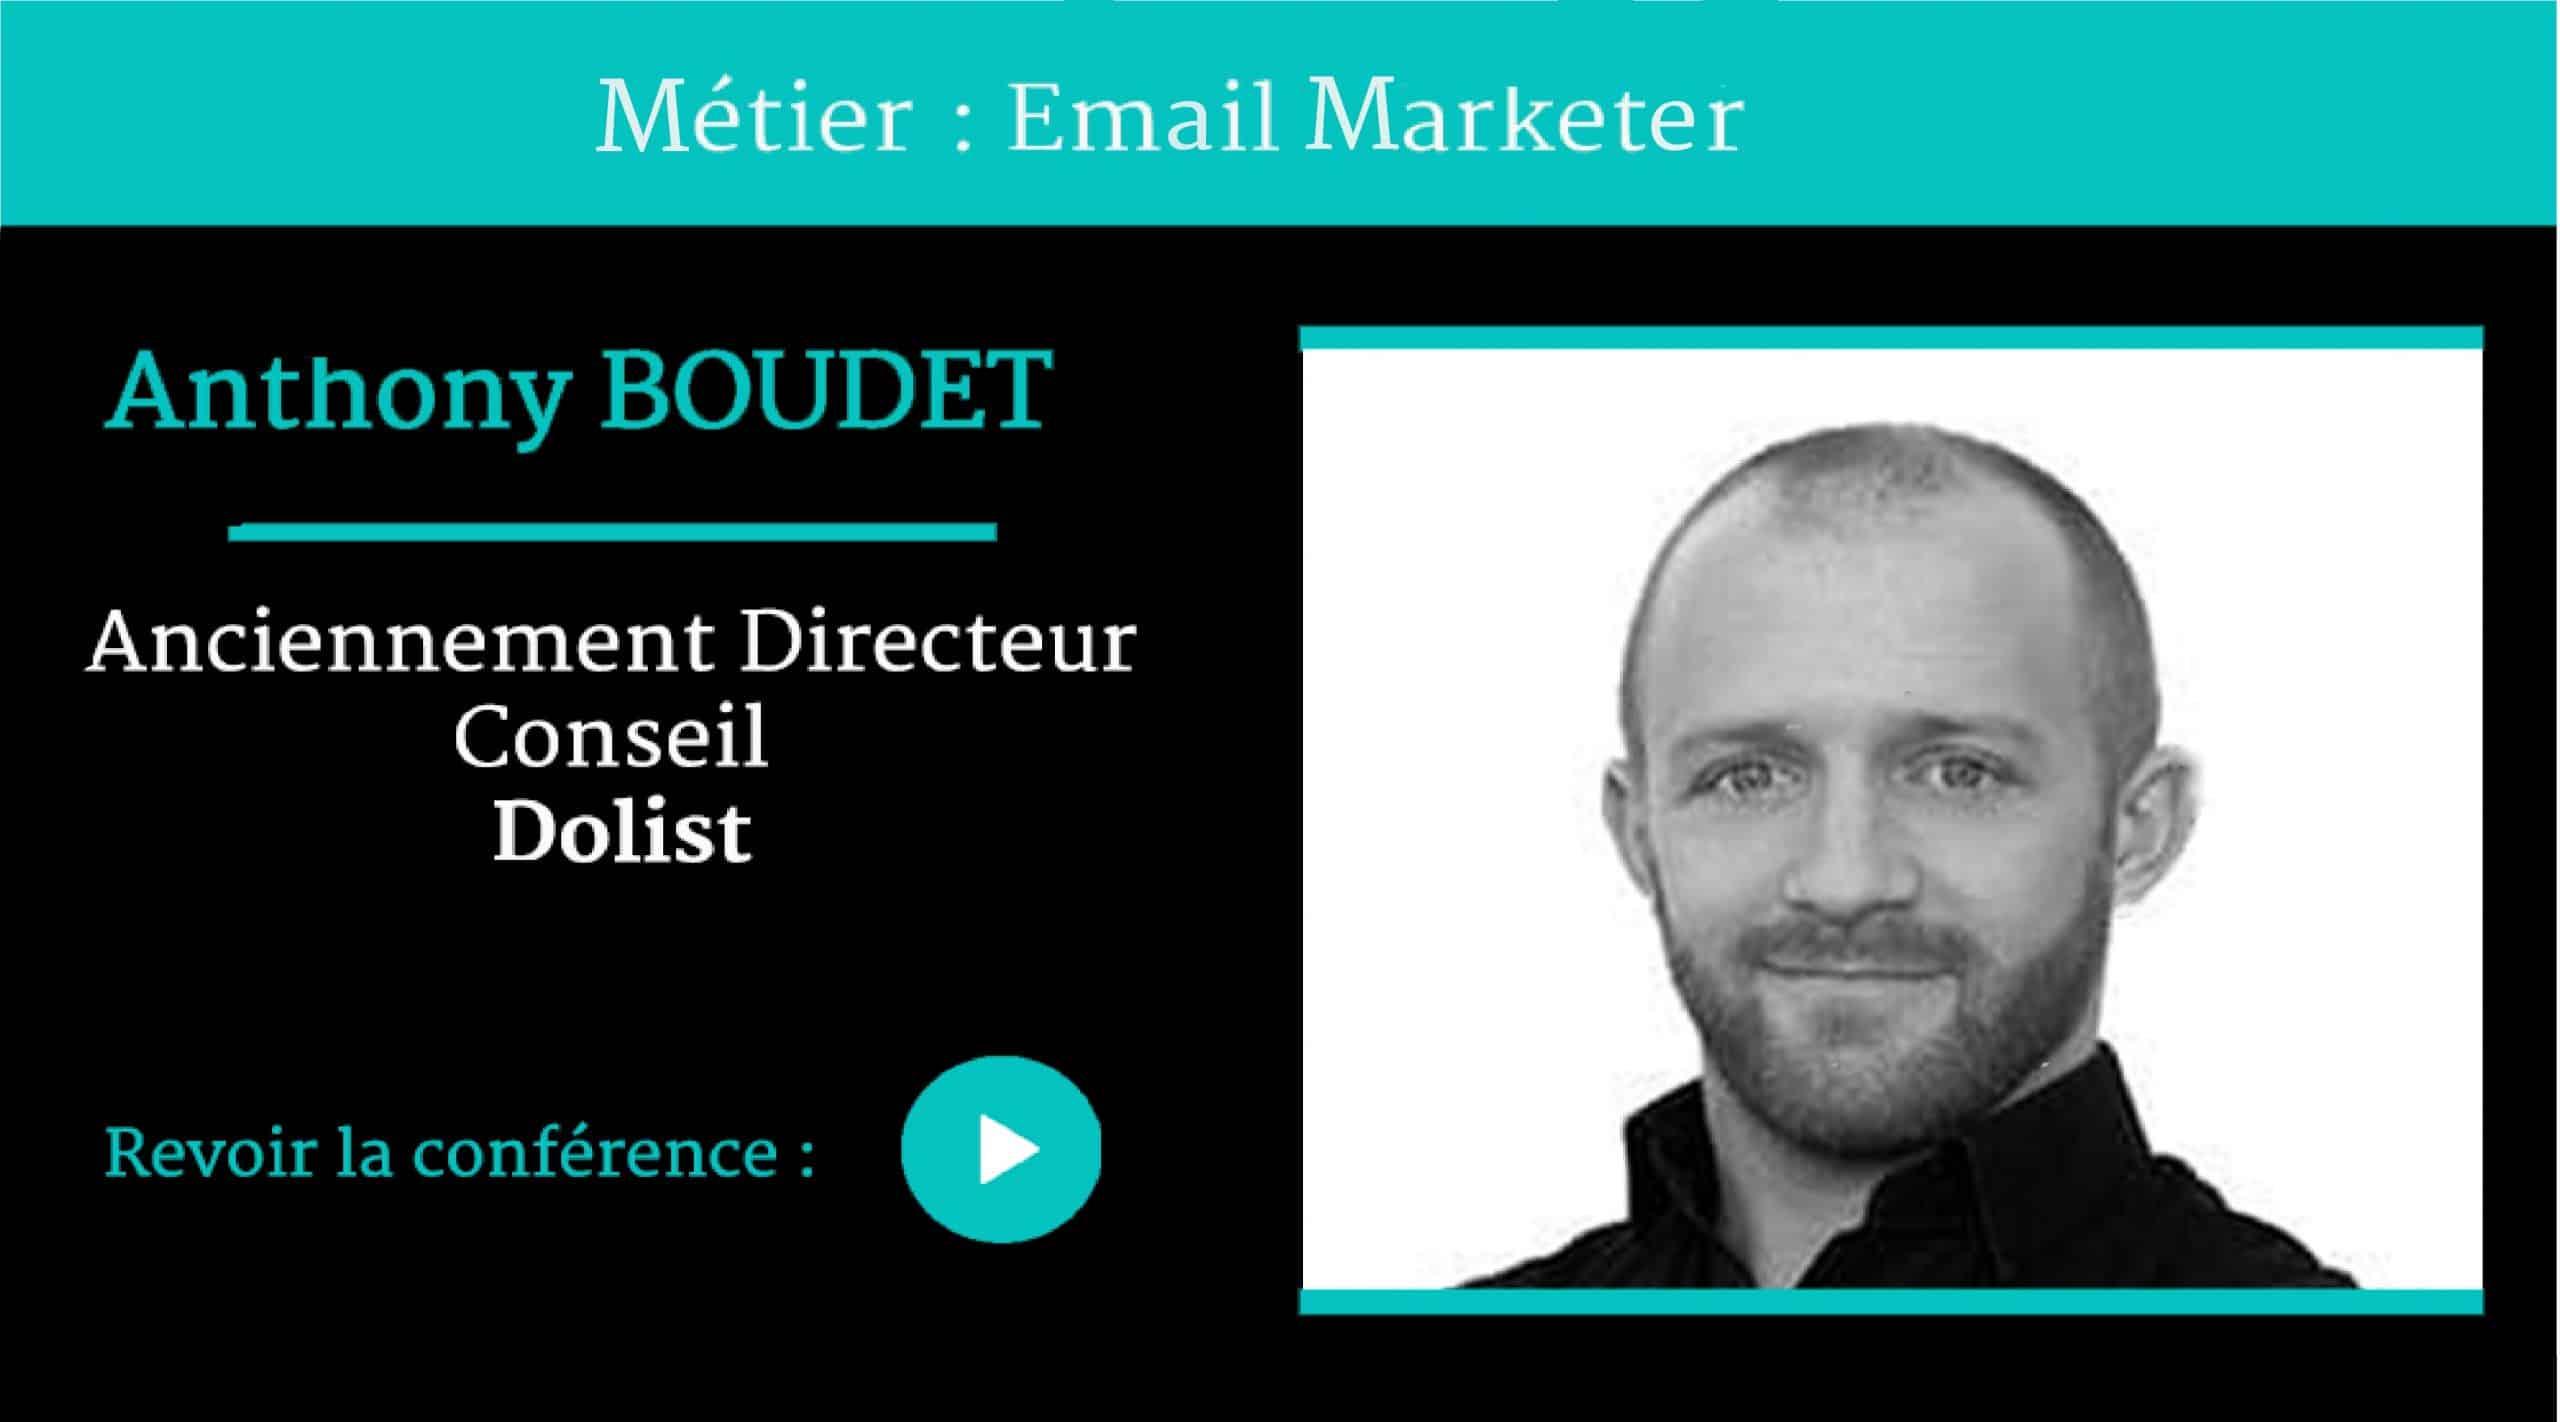 Métier Email MARKETER, conférence par Anthony BOUDET ,pour Naïas – National Institute of Advertising Strategy